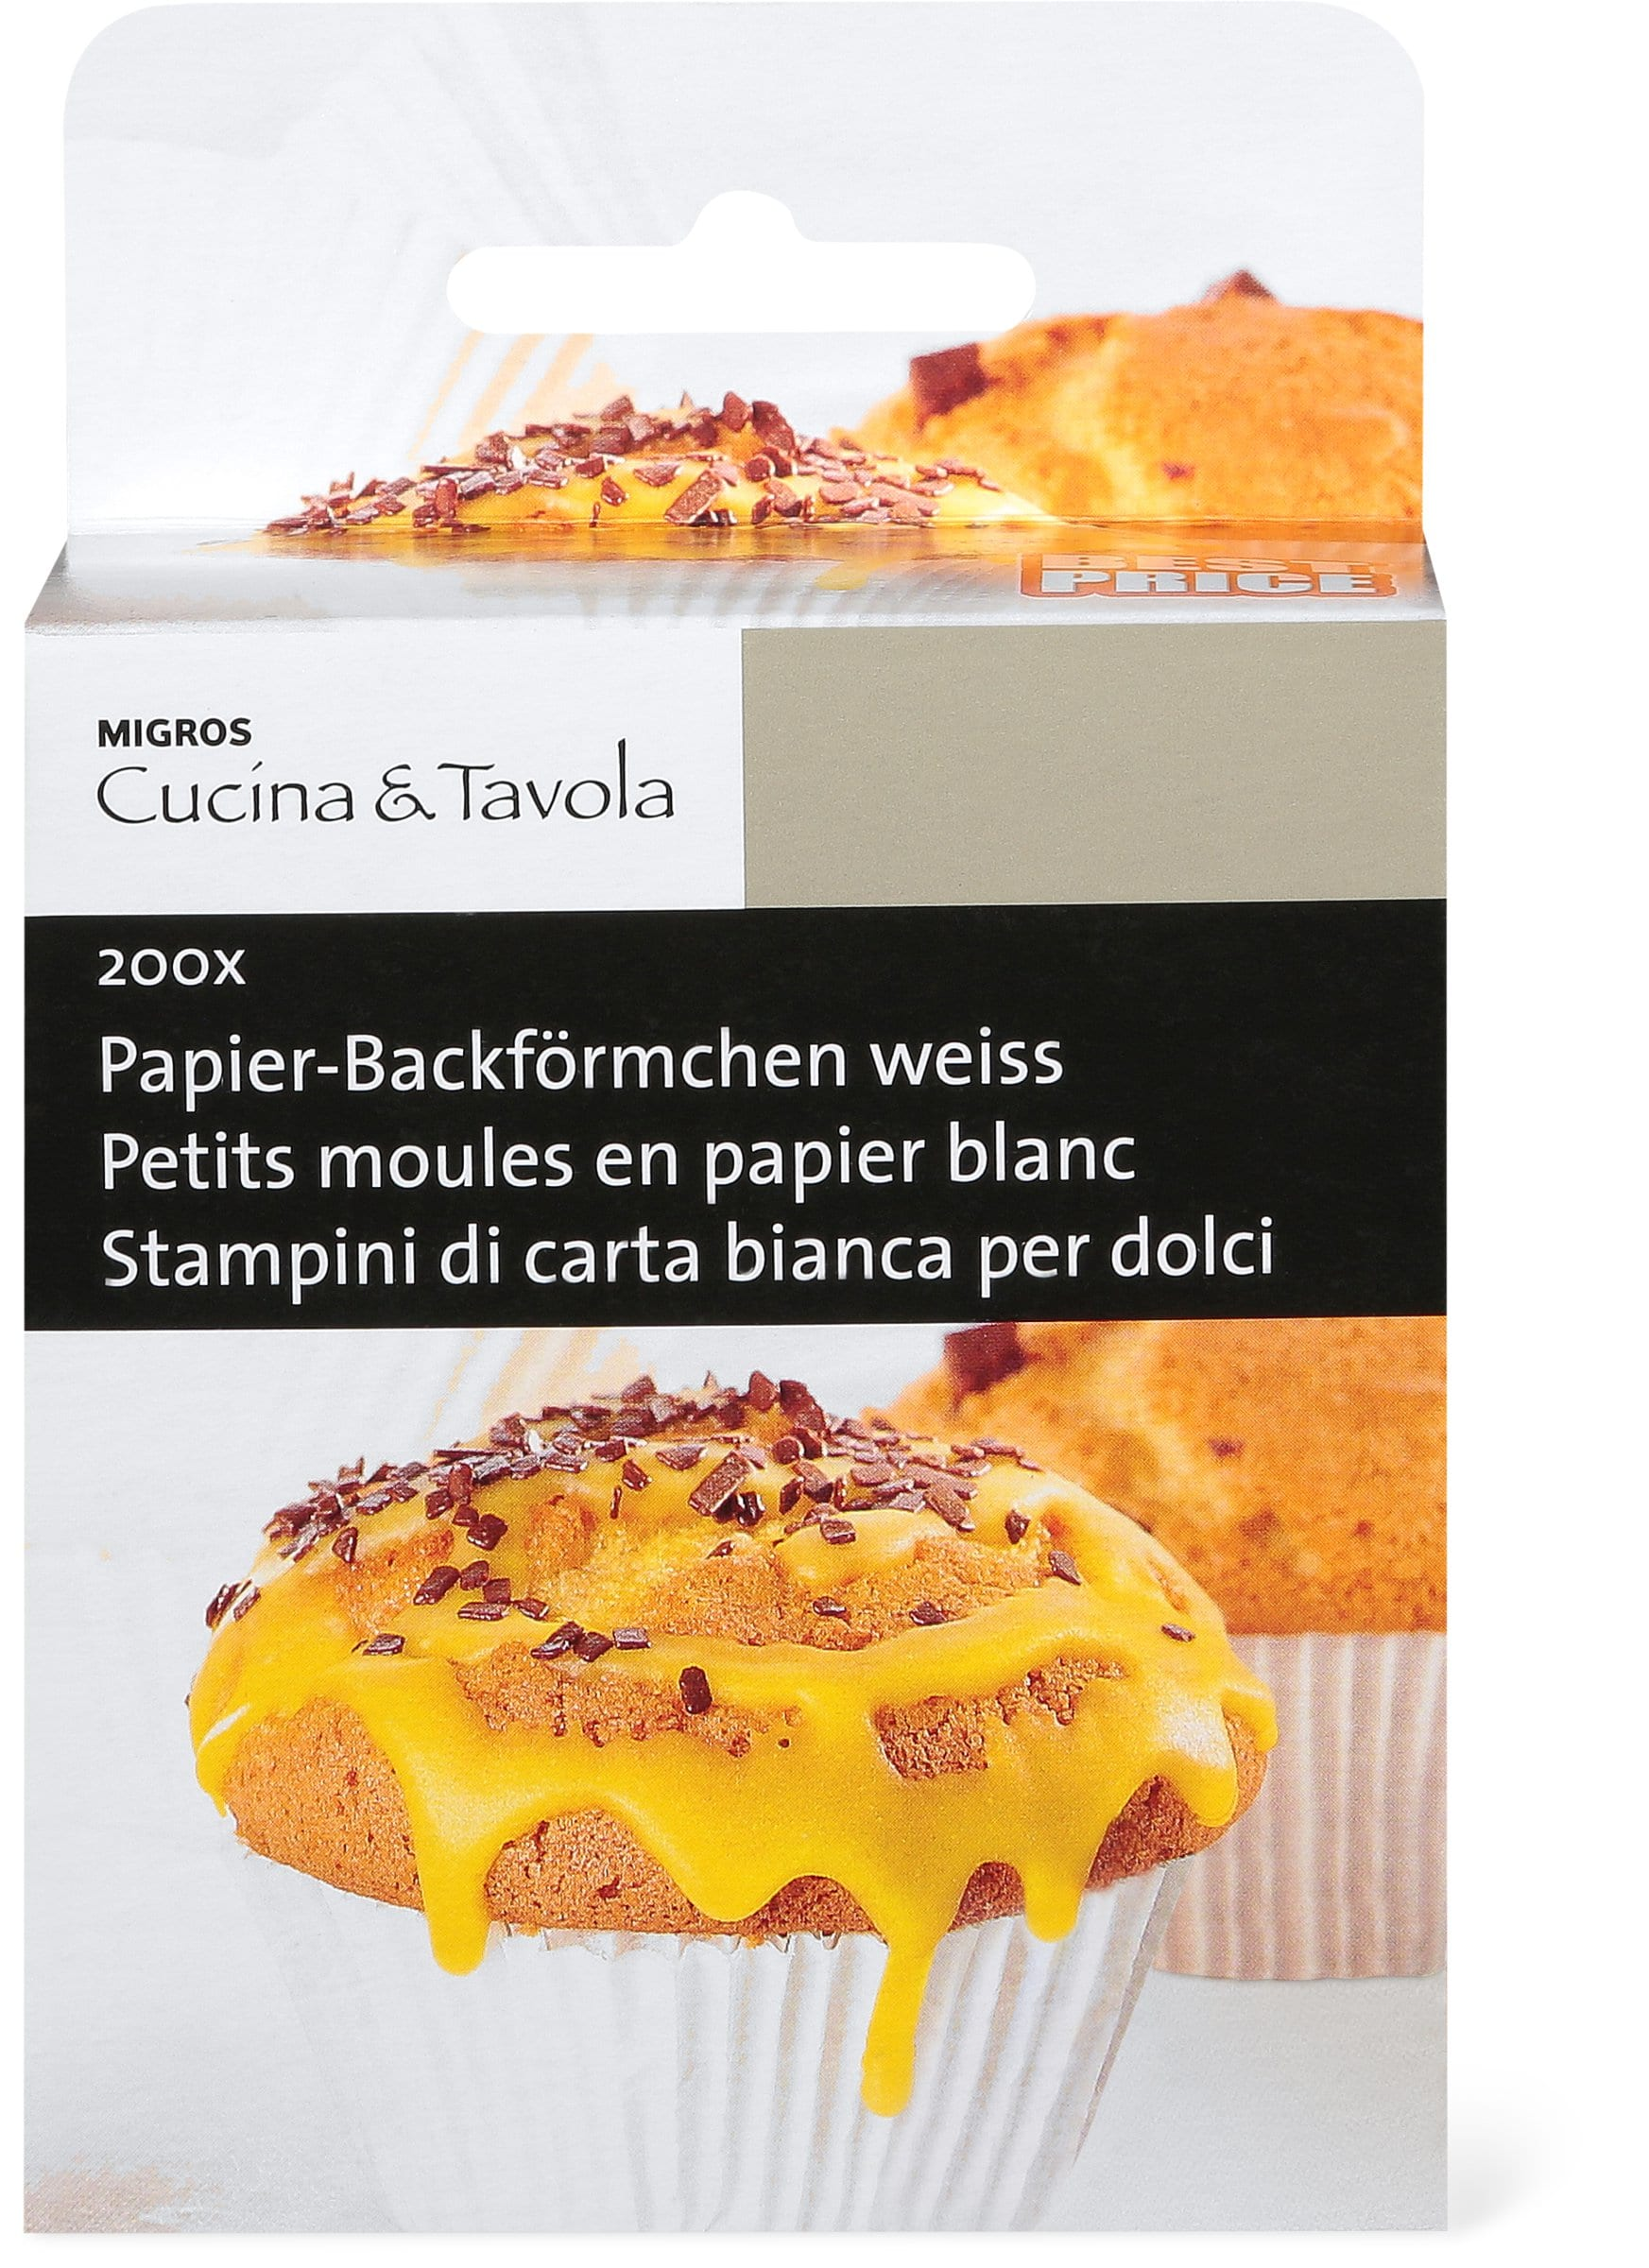 Cucina & Tavola CUCINA & TAVOLA Papier-Backförmchen